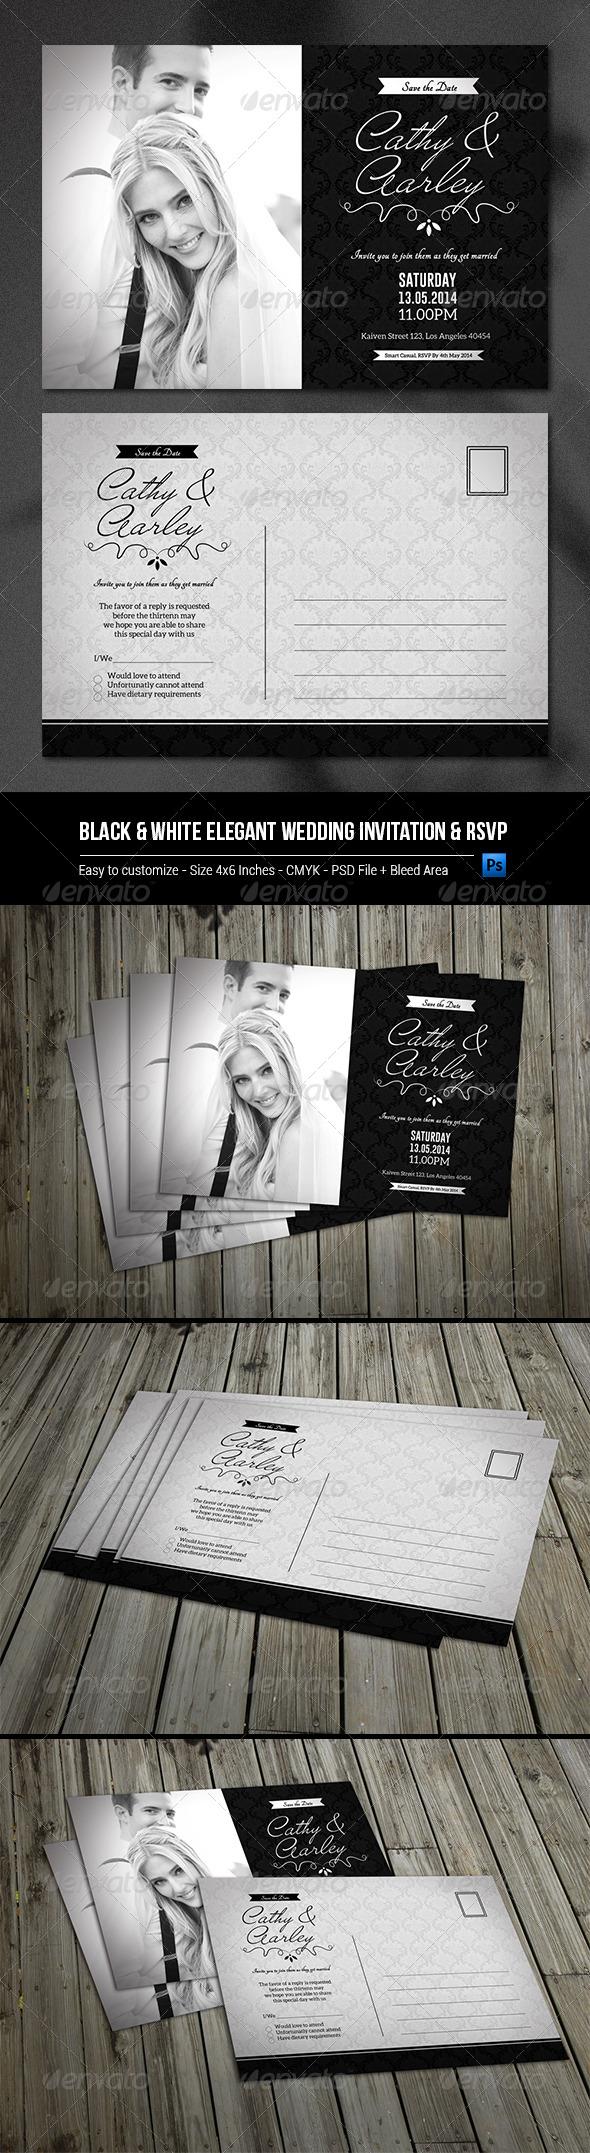 GraphicRiver Black & White Elegant Wedding Invitation & RSVP 8055853